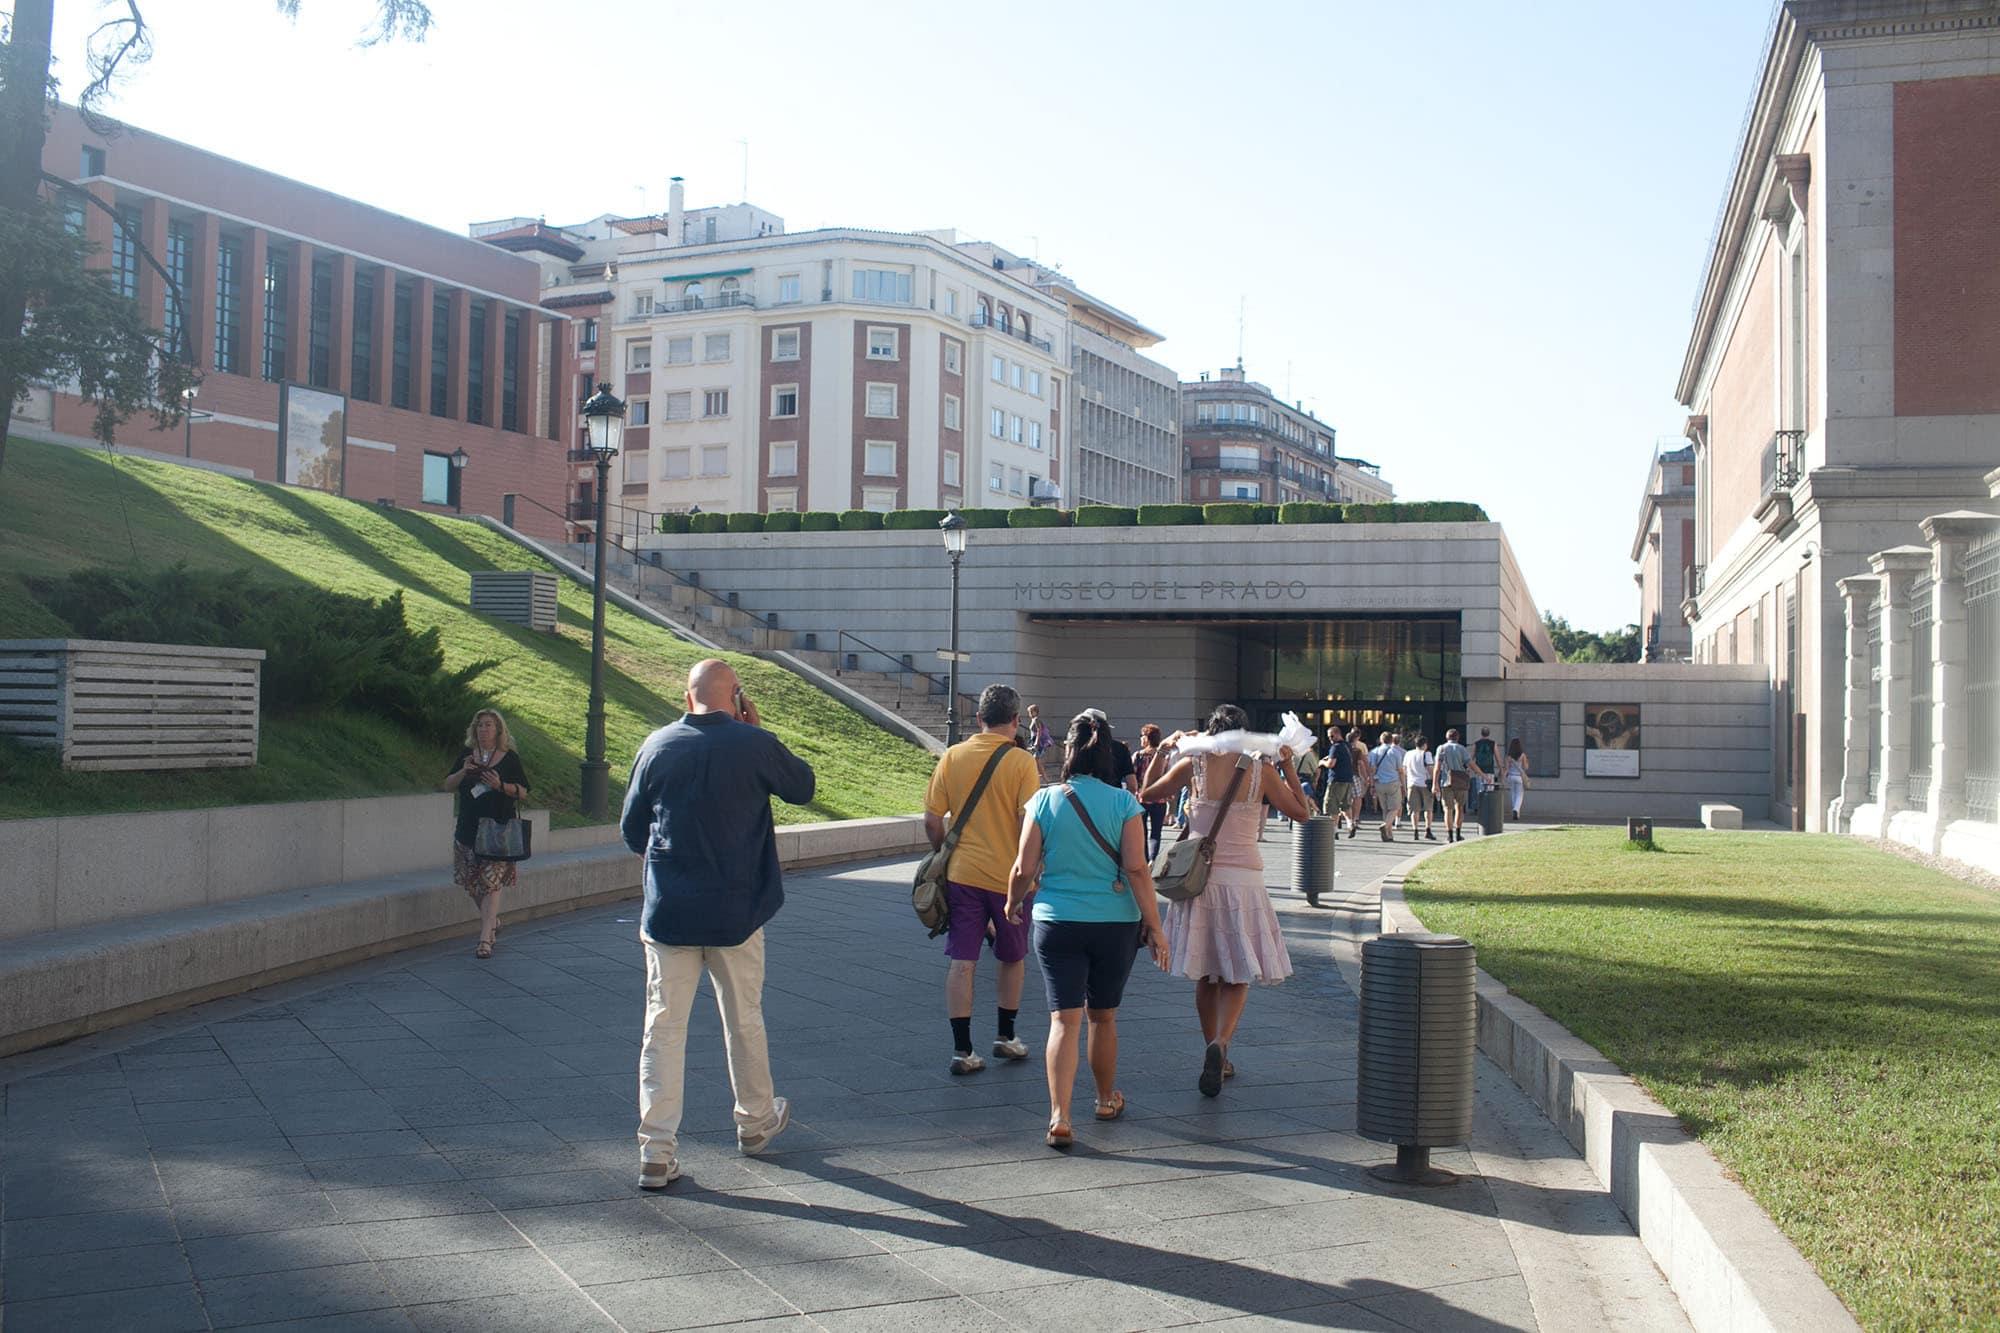 Museo del Prado in Madrid, Spain.